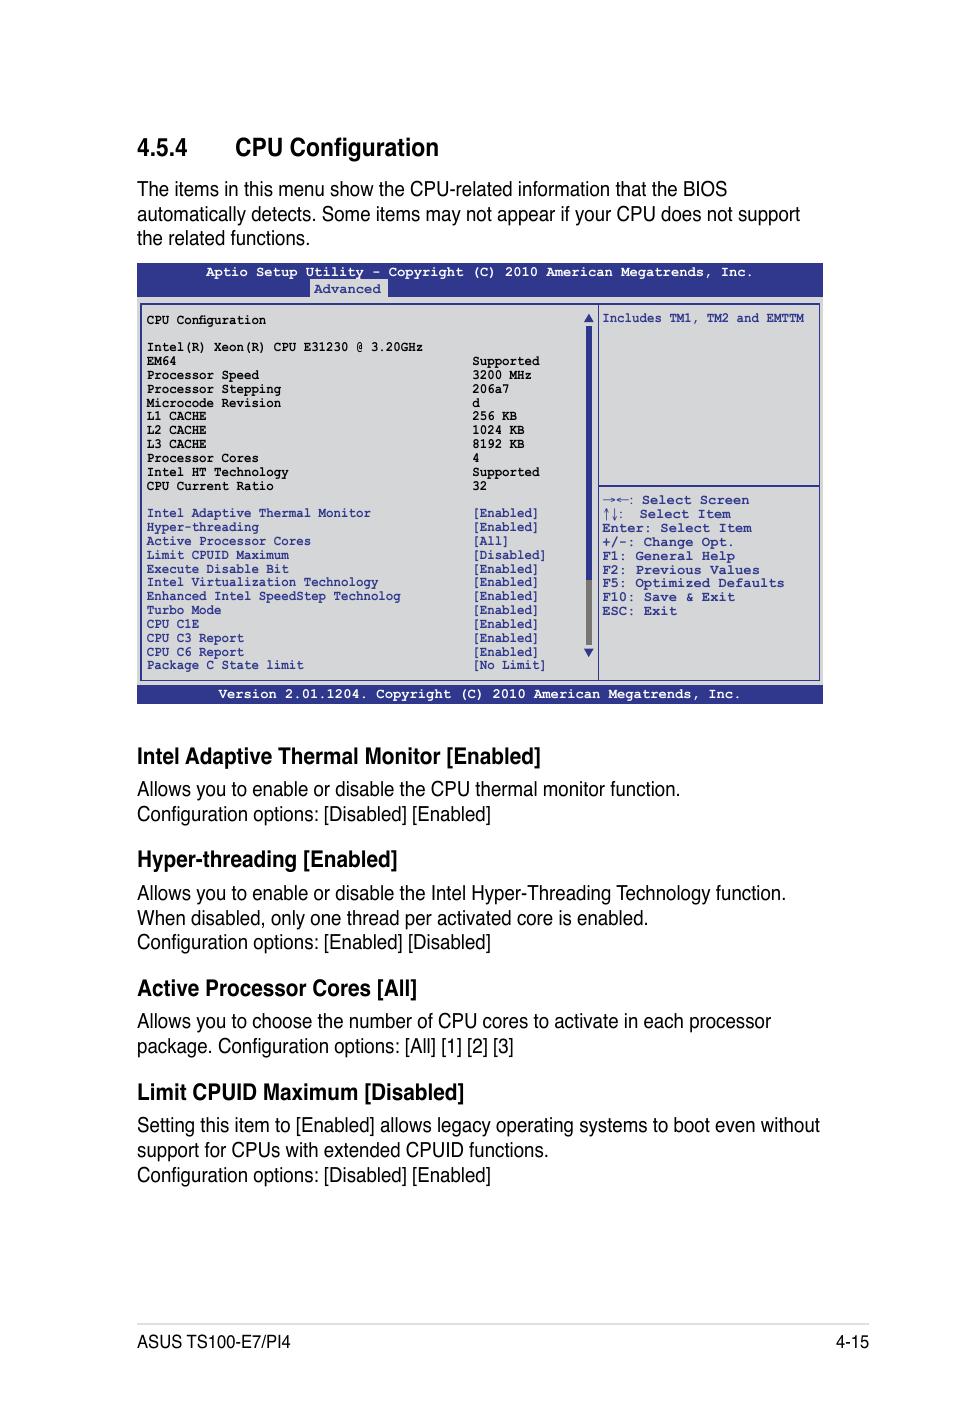 4 cpu configuration, Intel adaptive thermal monitor [enabled